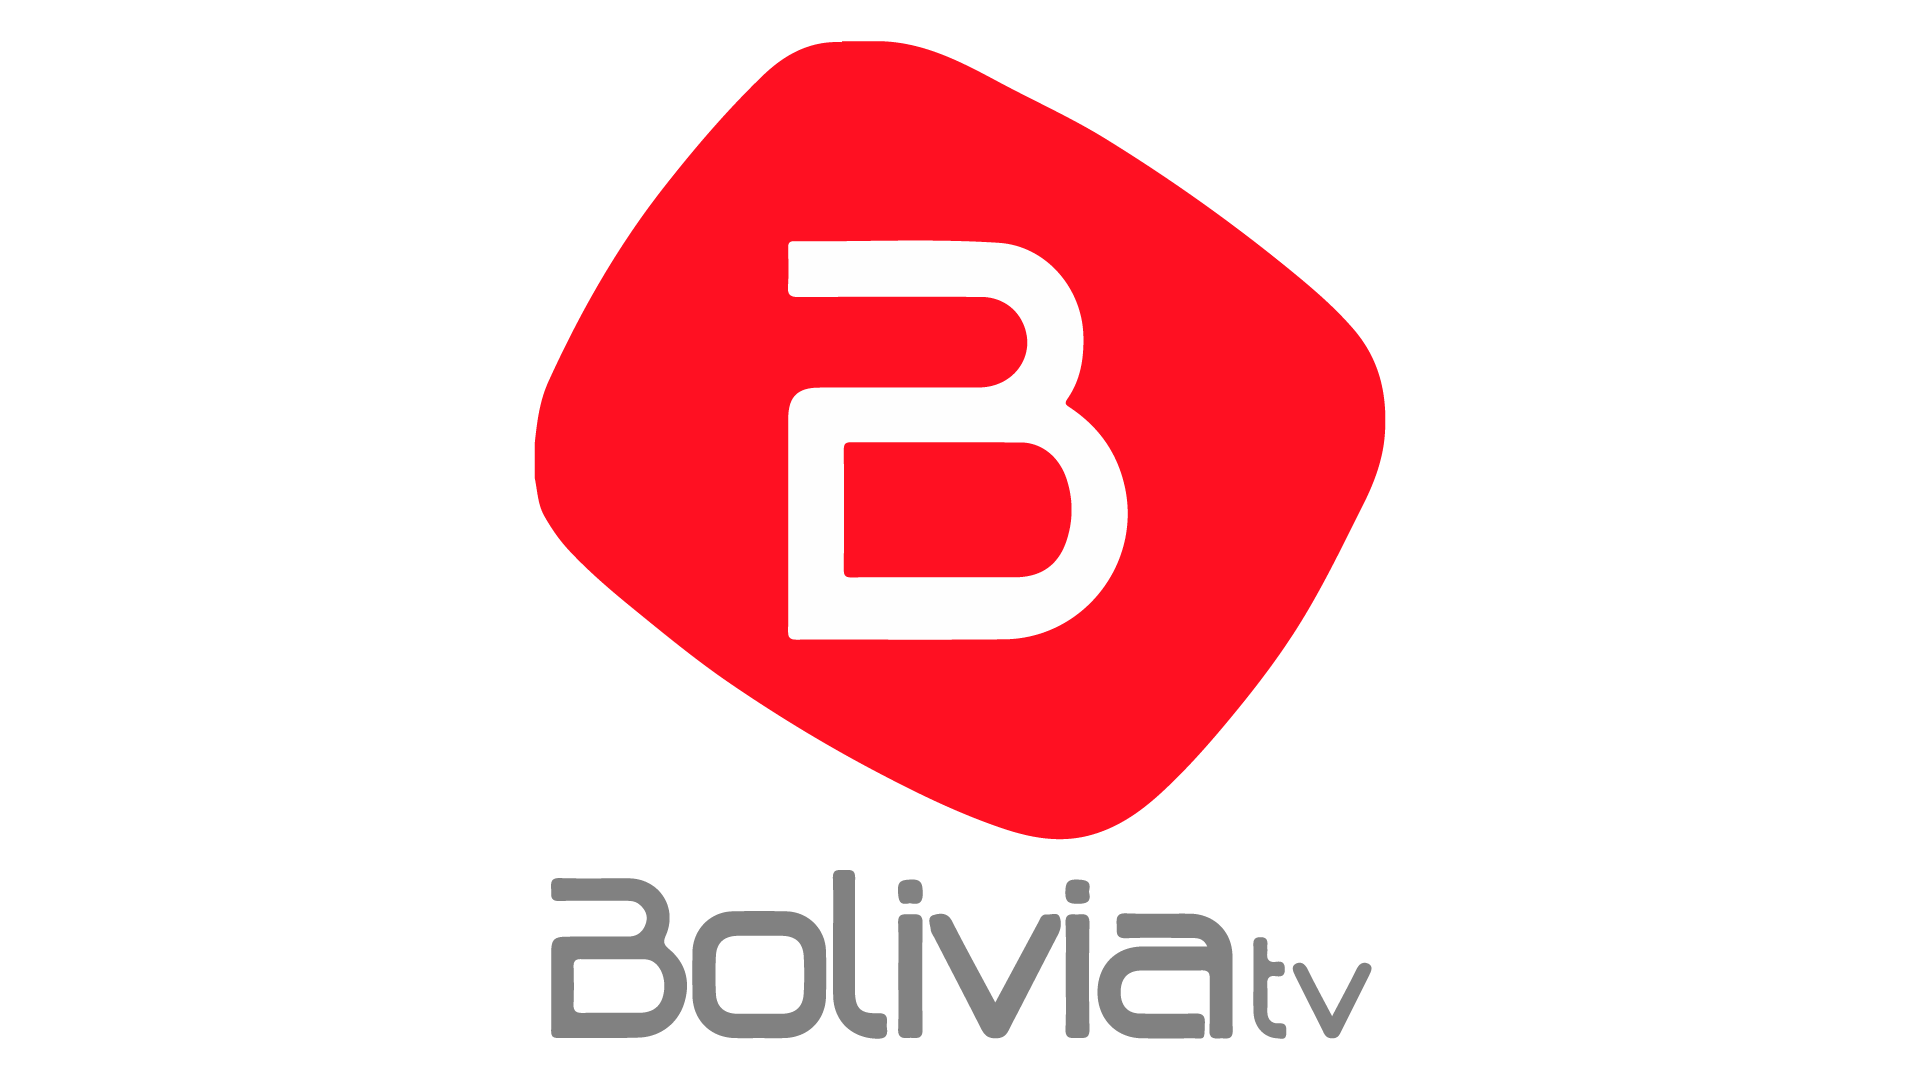 Bolivia Deportes TV 7.2 en vivo, Online